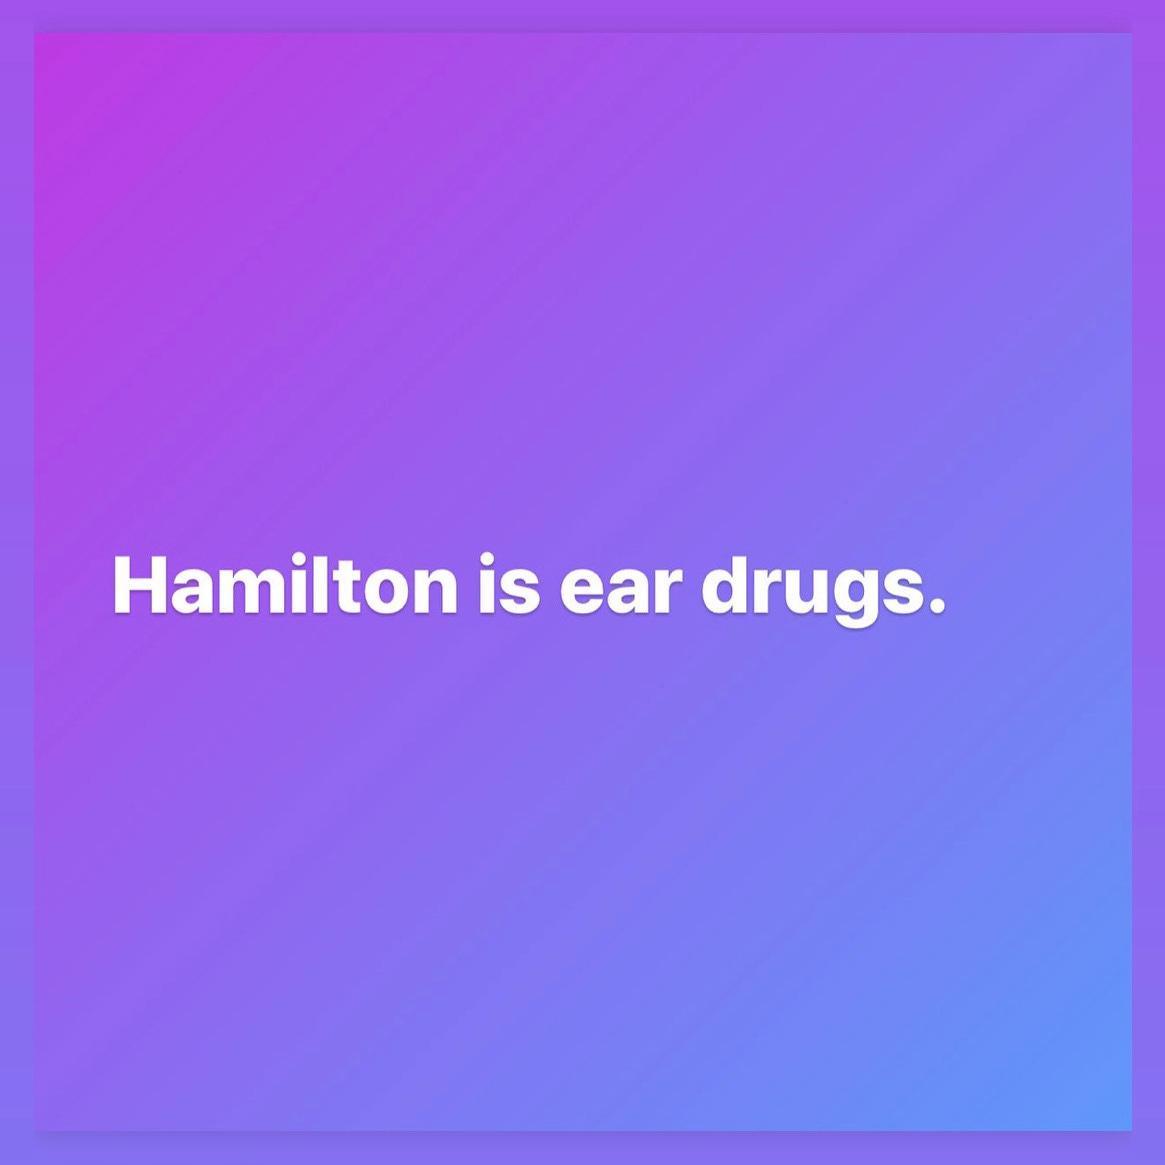 Hamilton is ear drugs